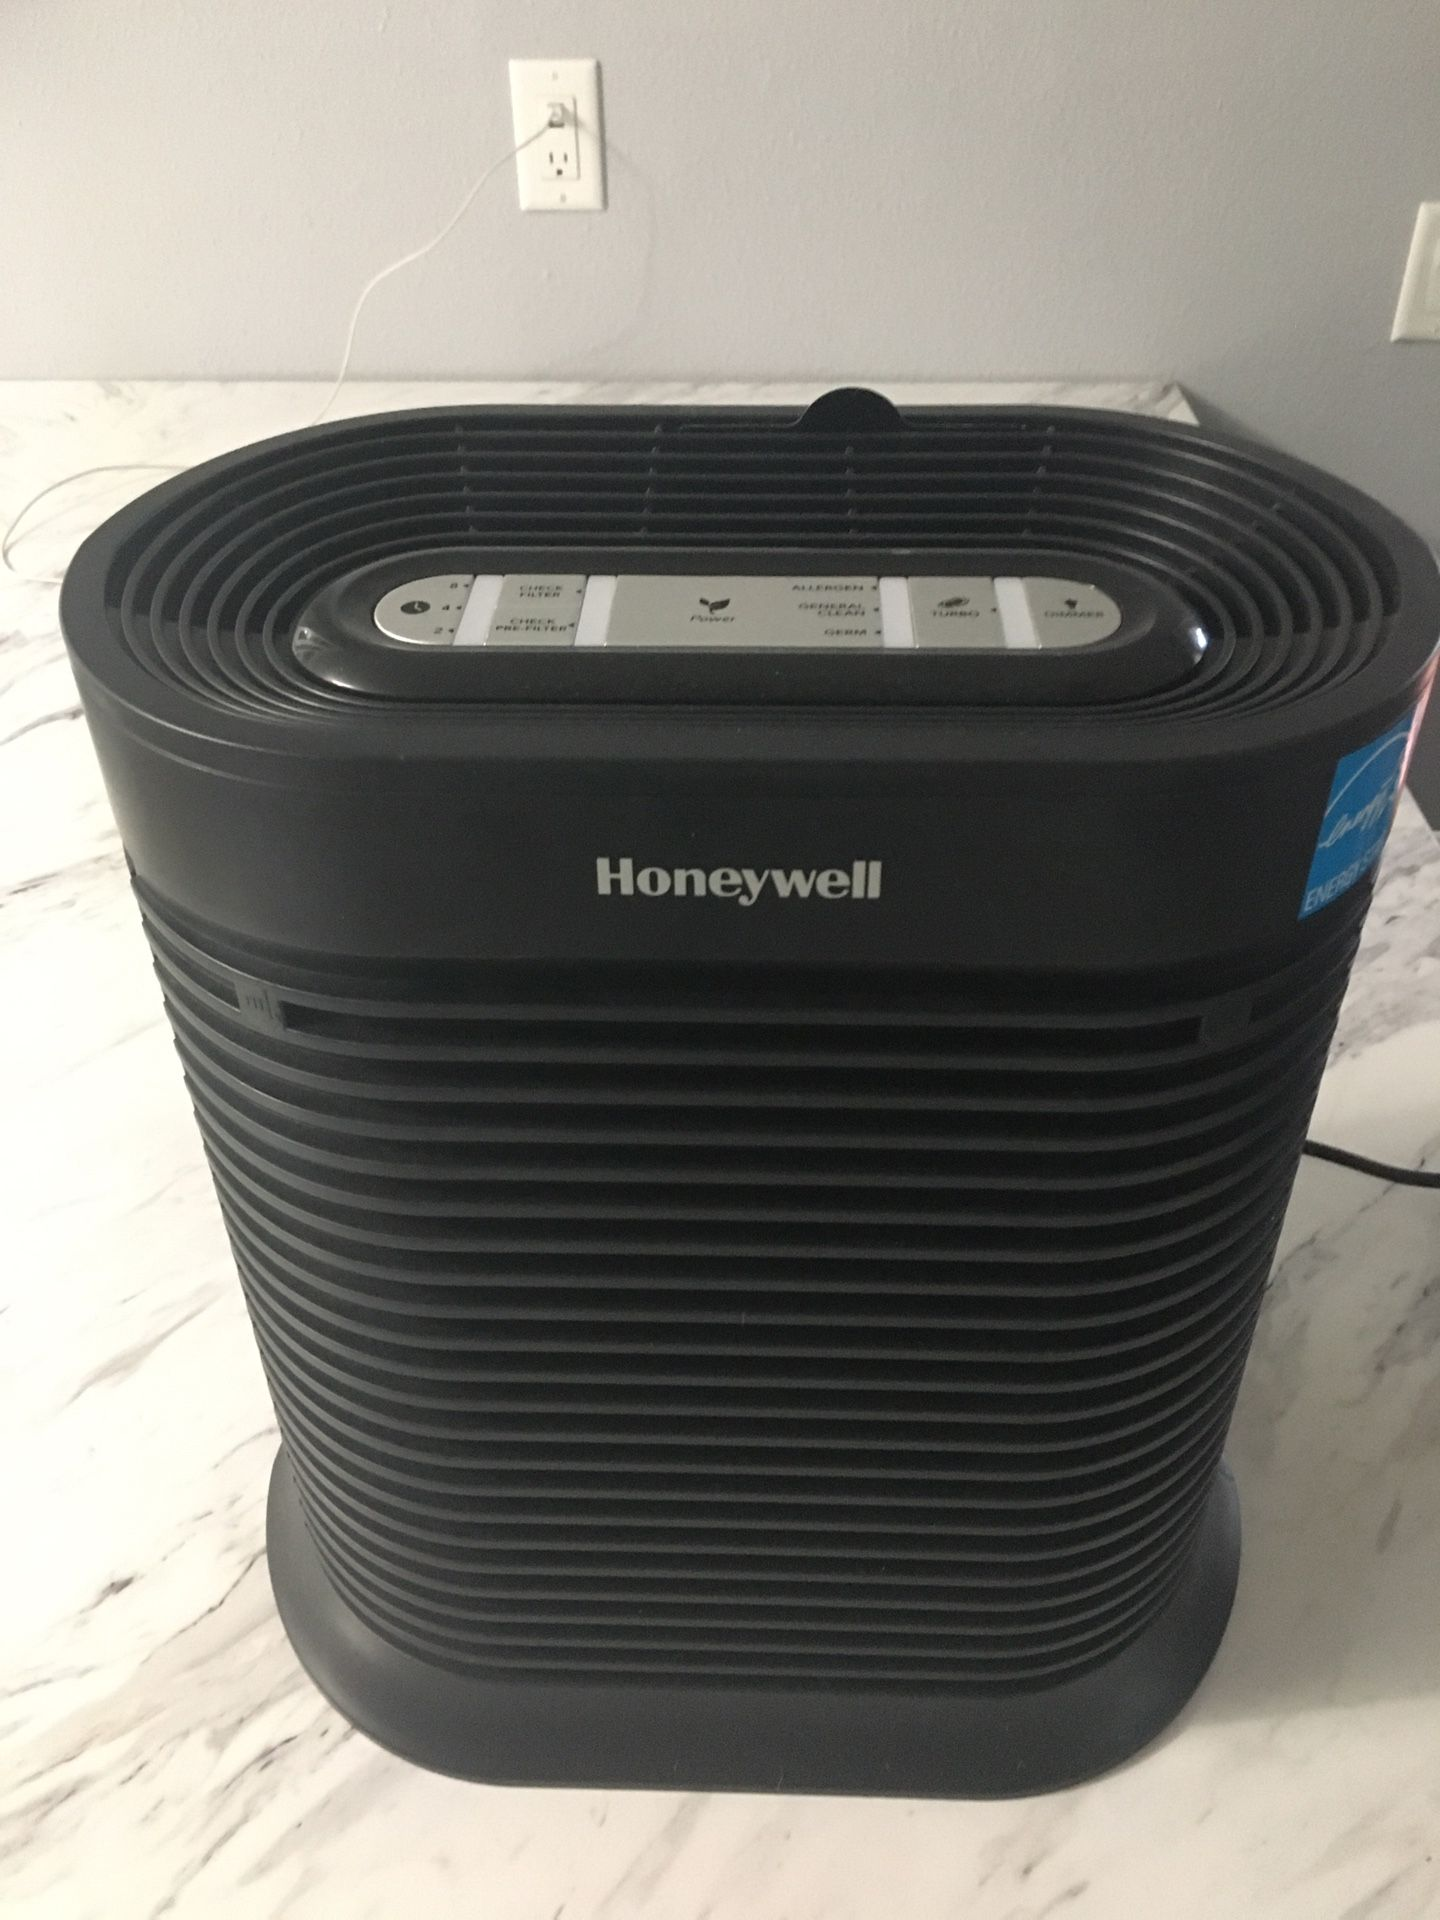 Air Filter - Room -Honeywell HPA 100 True HEPA Allergen Remover